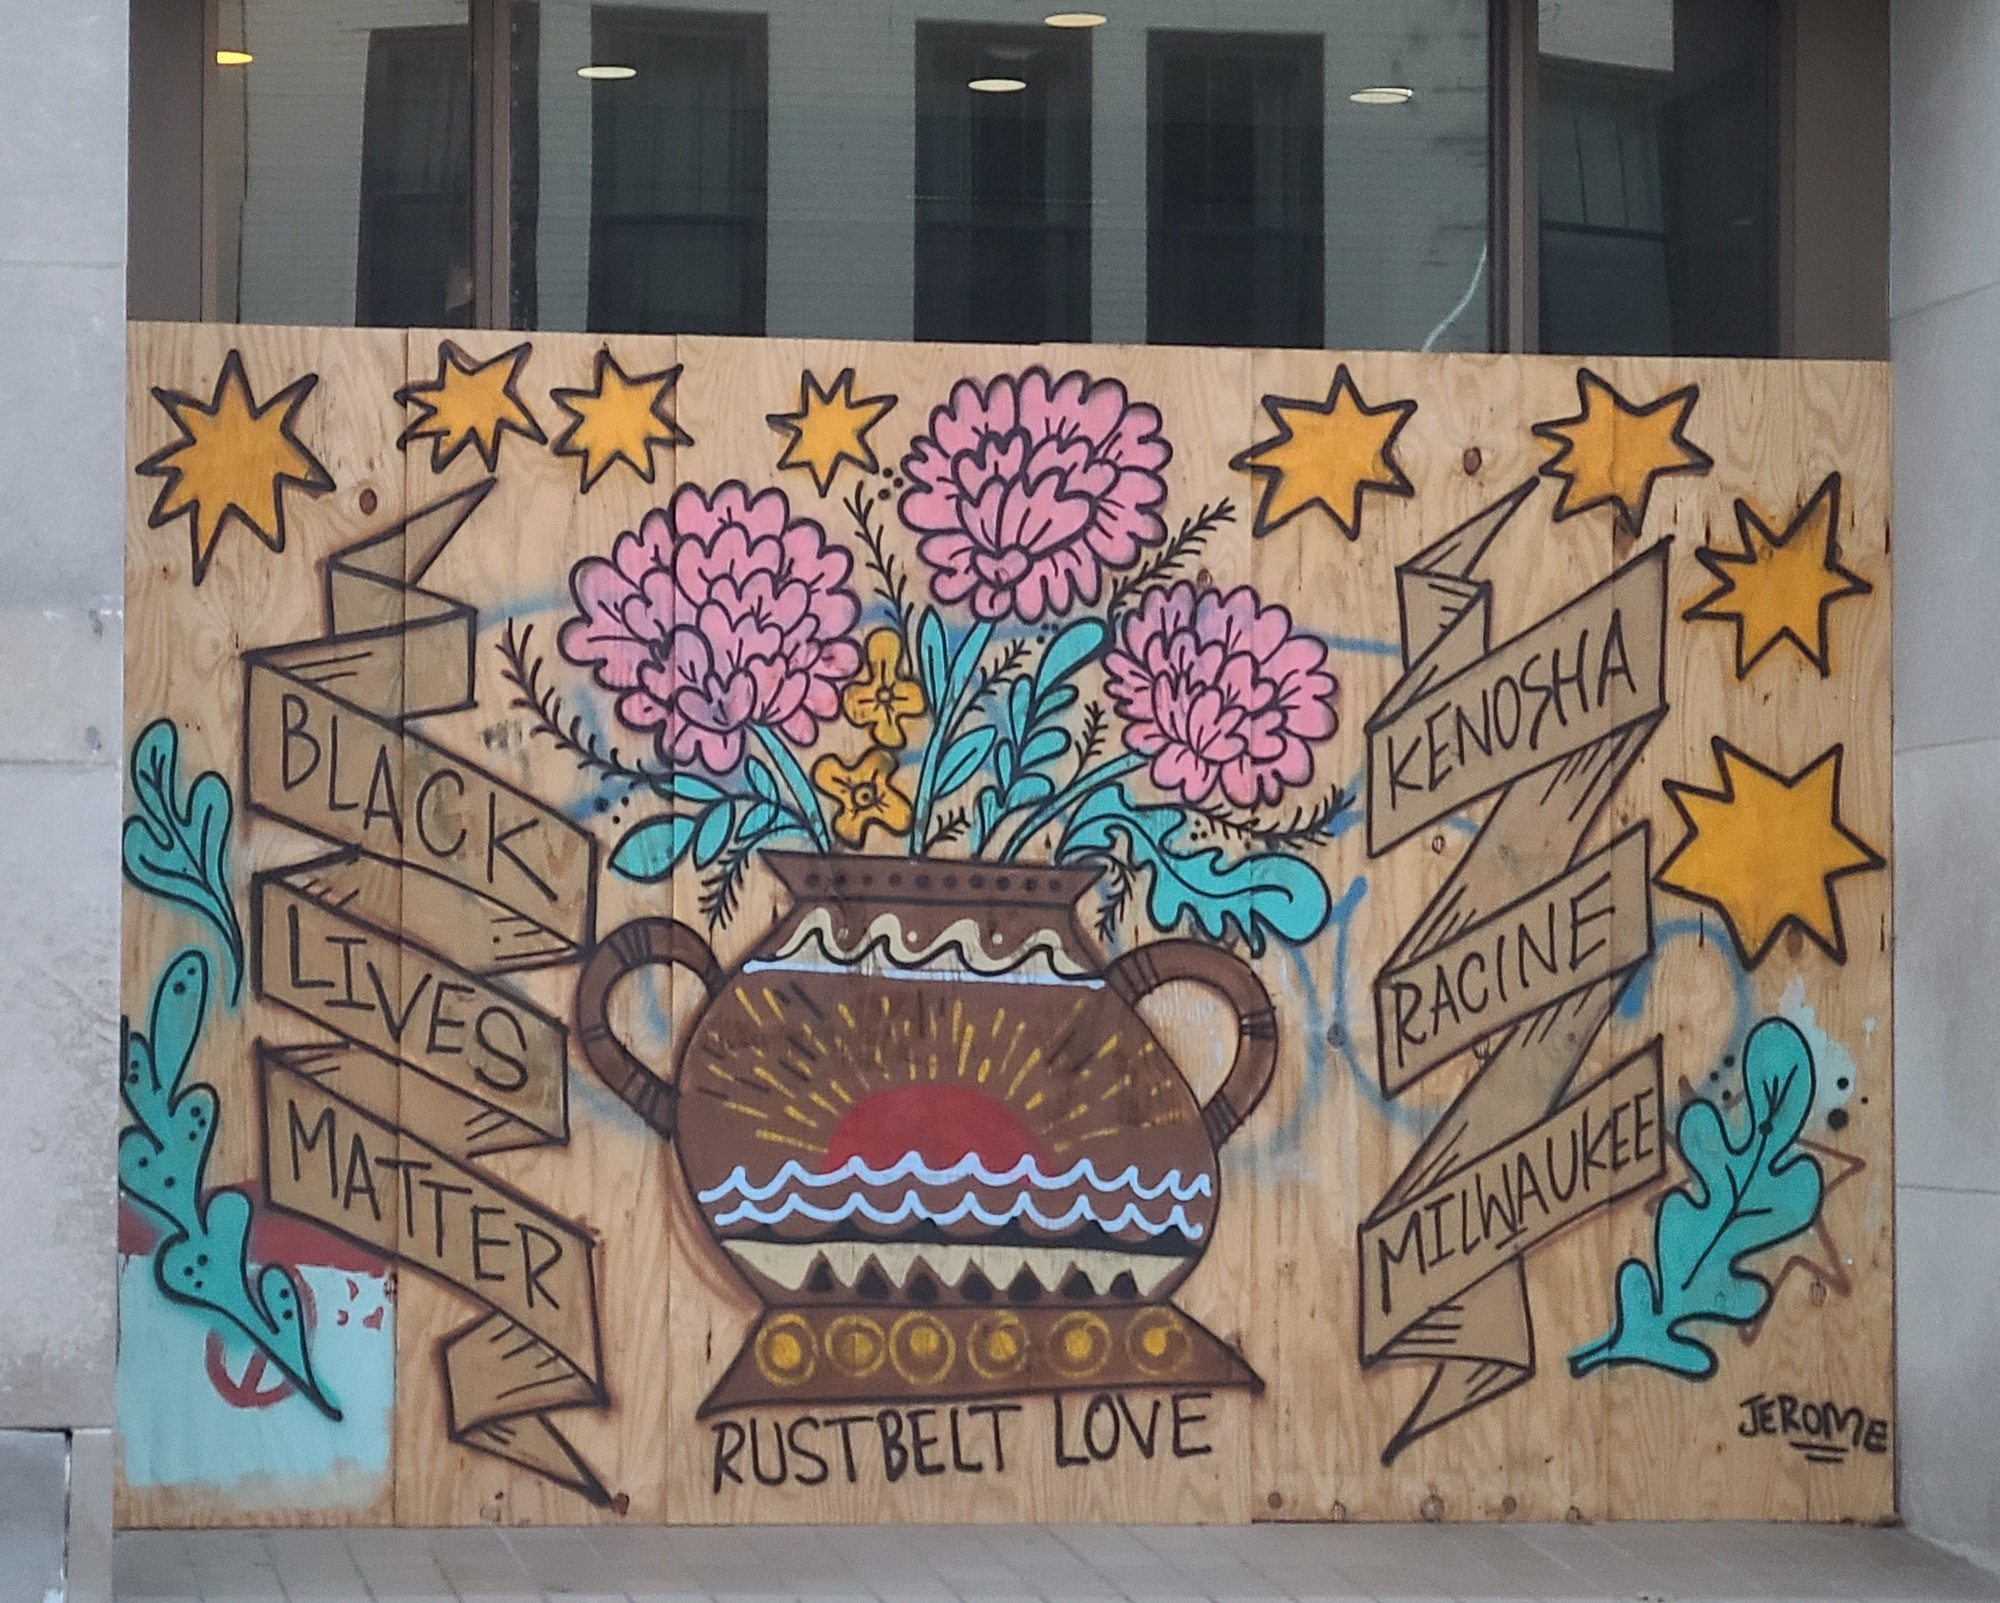 Rust Belt Love